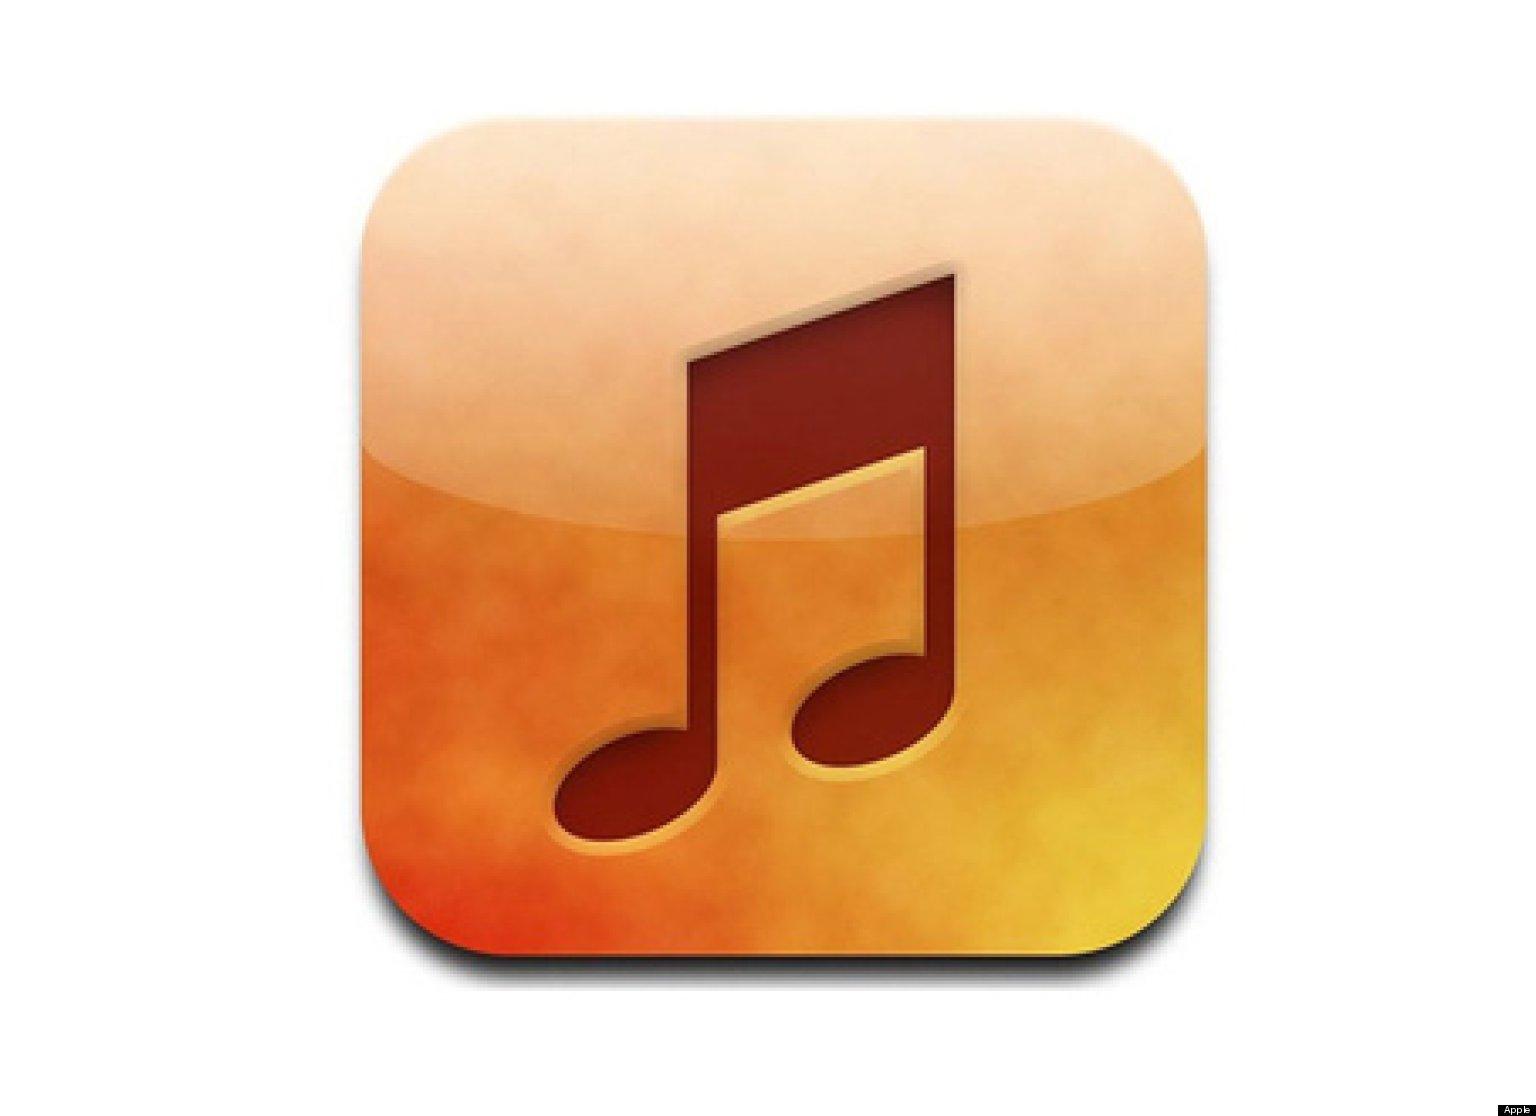 myspace blocks apple from trademarking iconic music logo